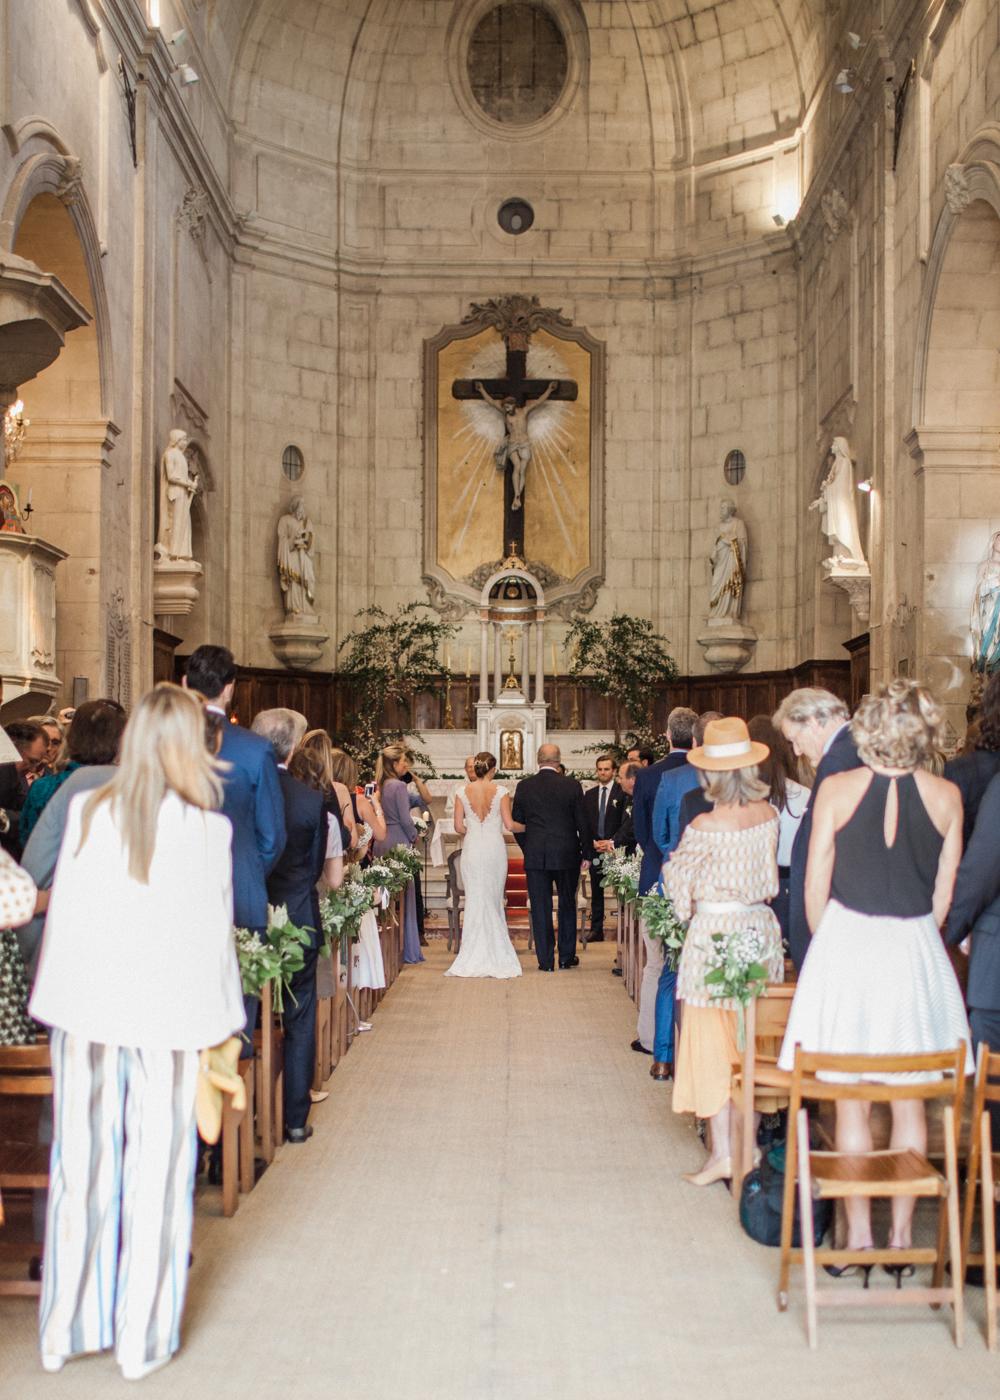 Provence_Wedding_(c)_Rory_Wylie-78.jpg